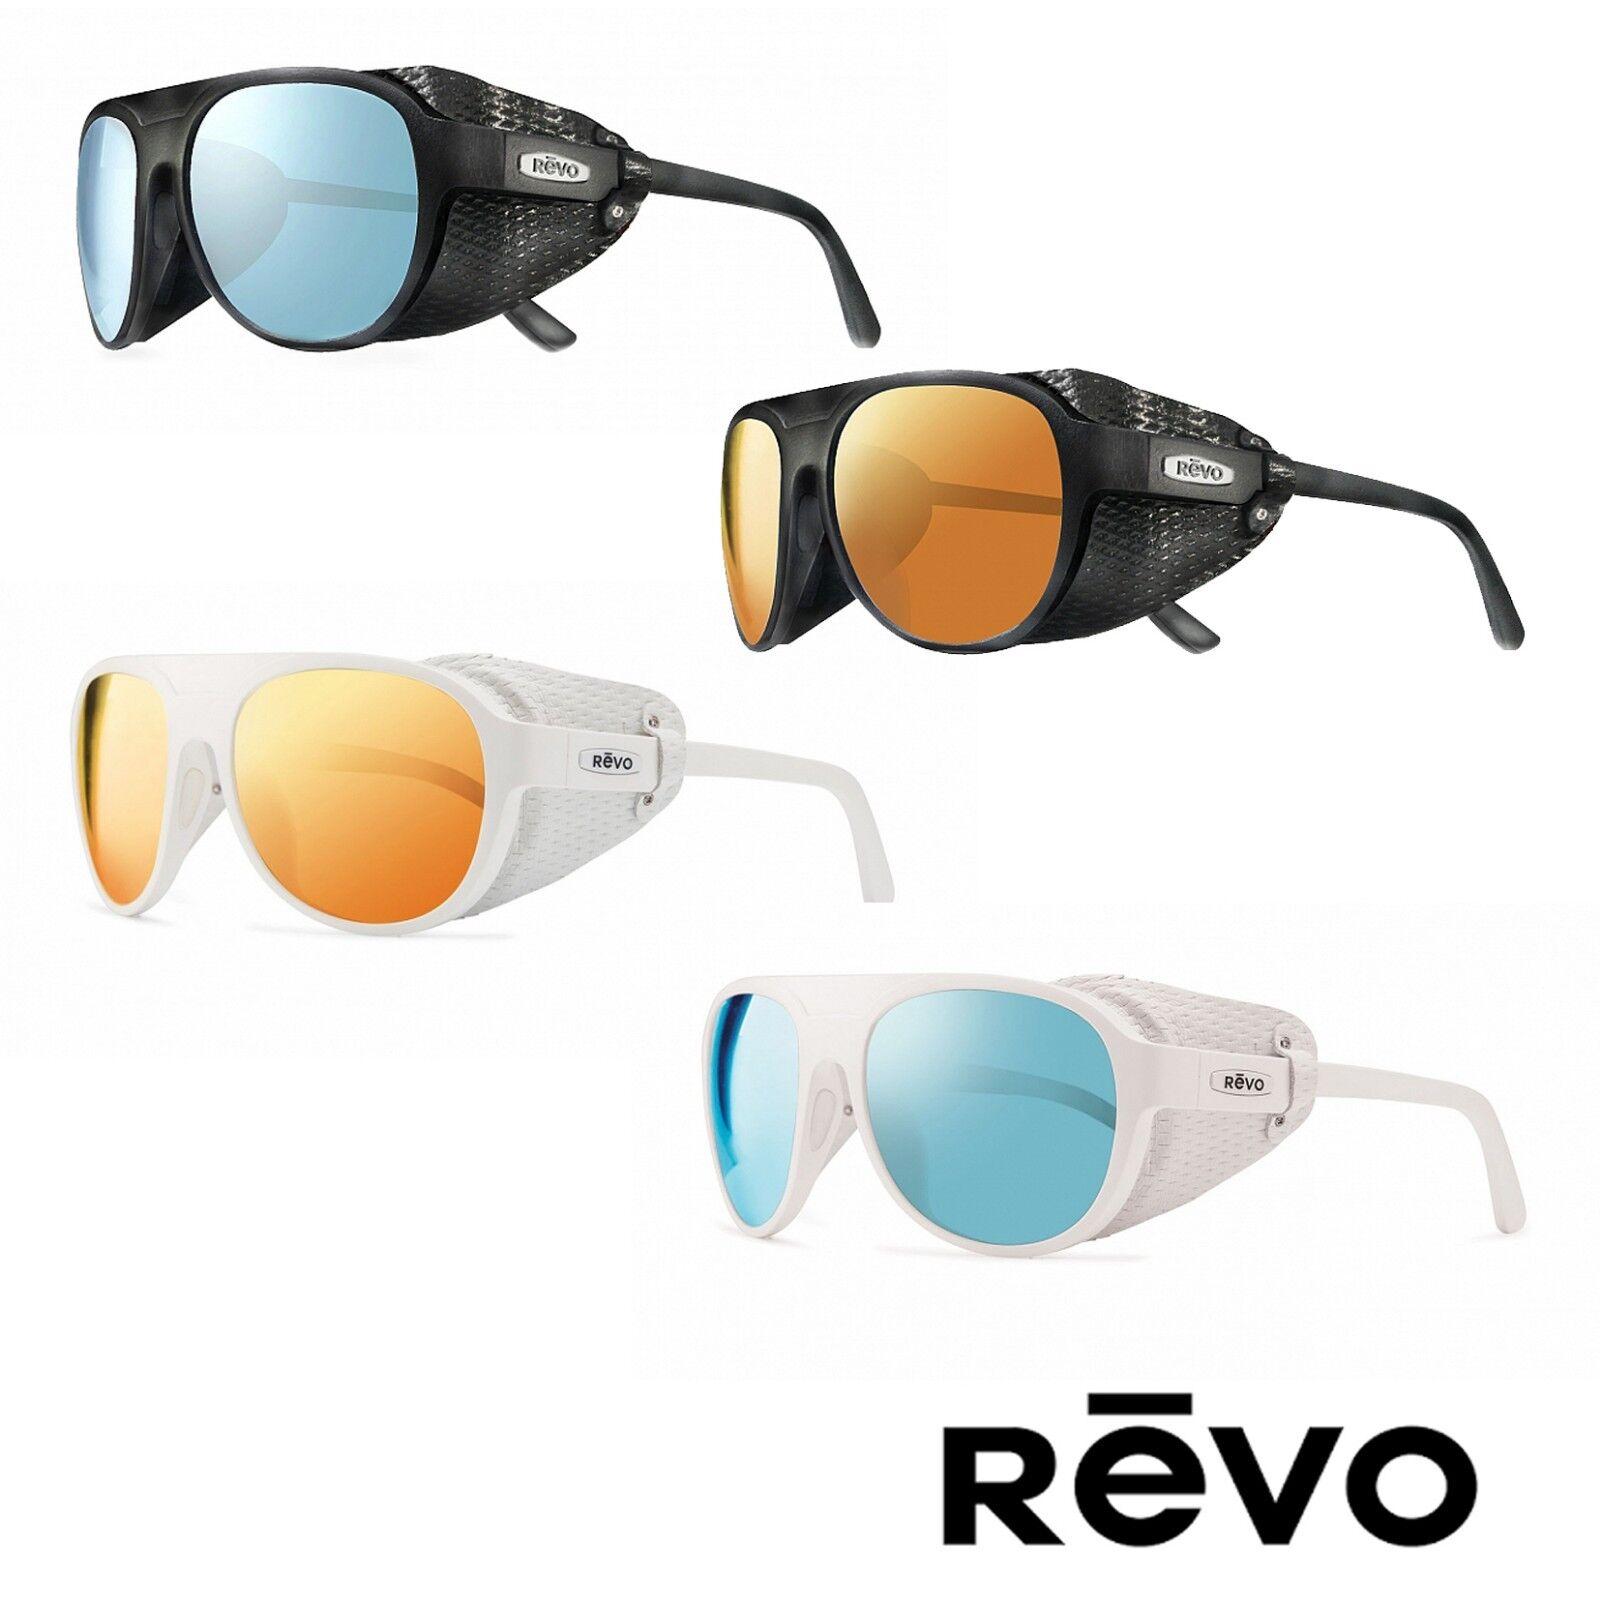 2b8d3b7ba01 REVO Traverse Re 1036 09 BL Polarized Oval Sunglasses White blue Water 57  Mm